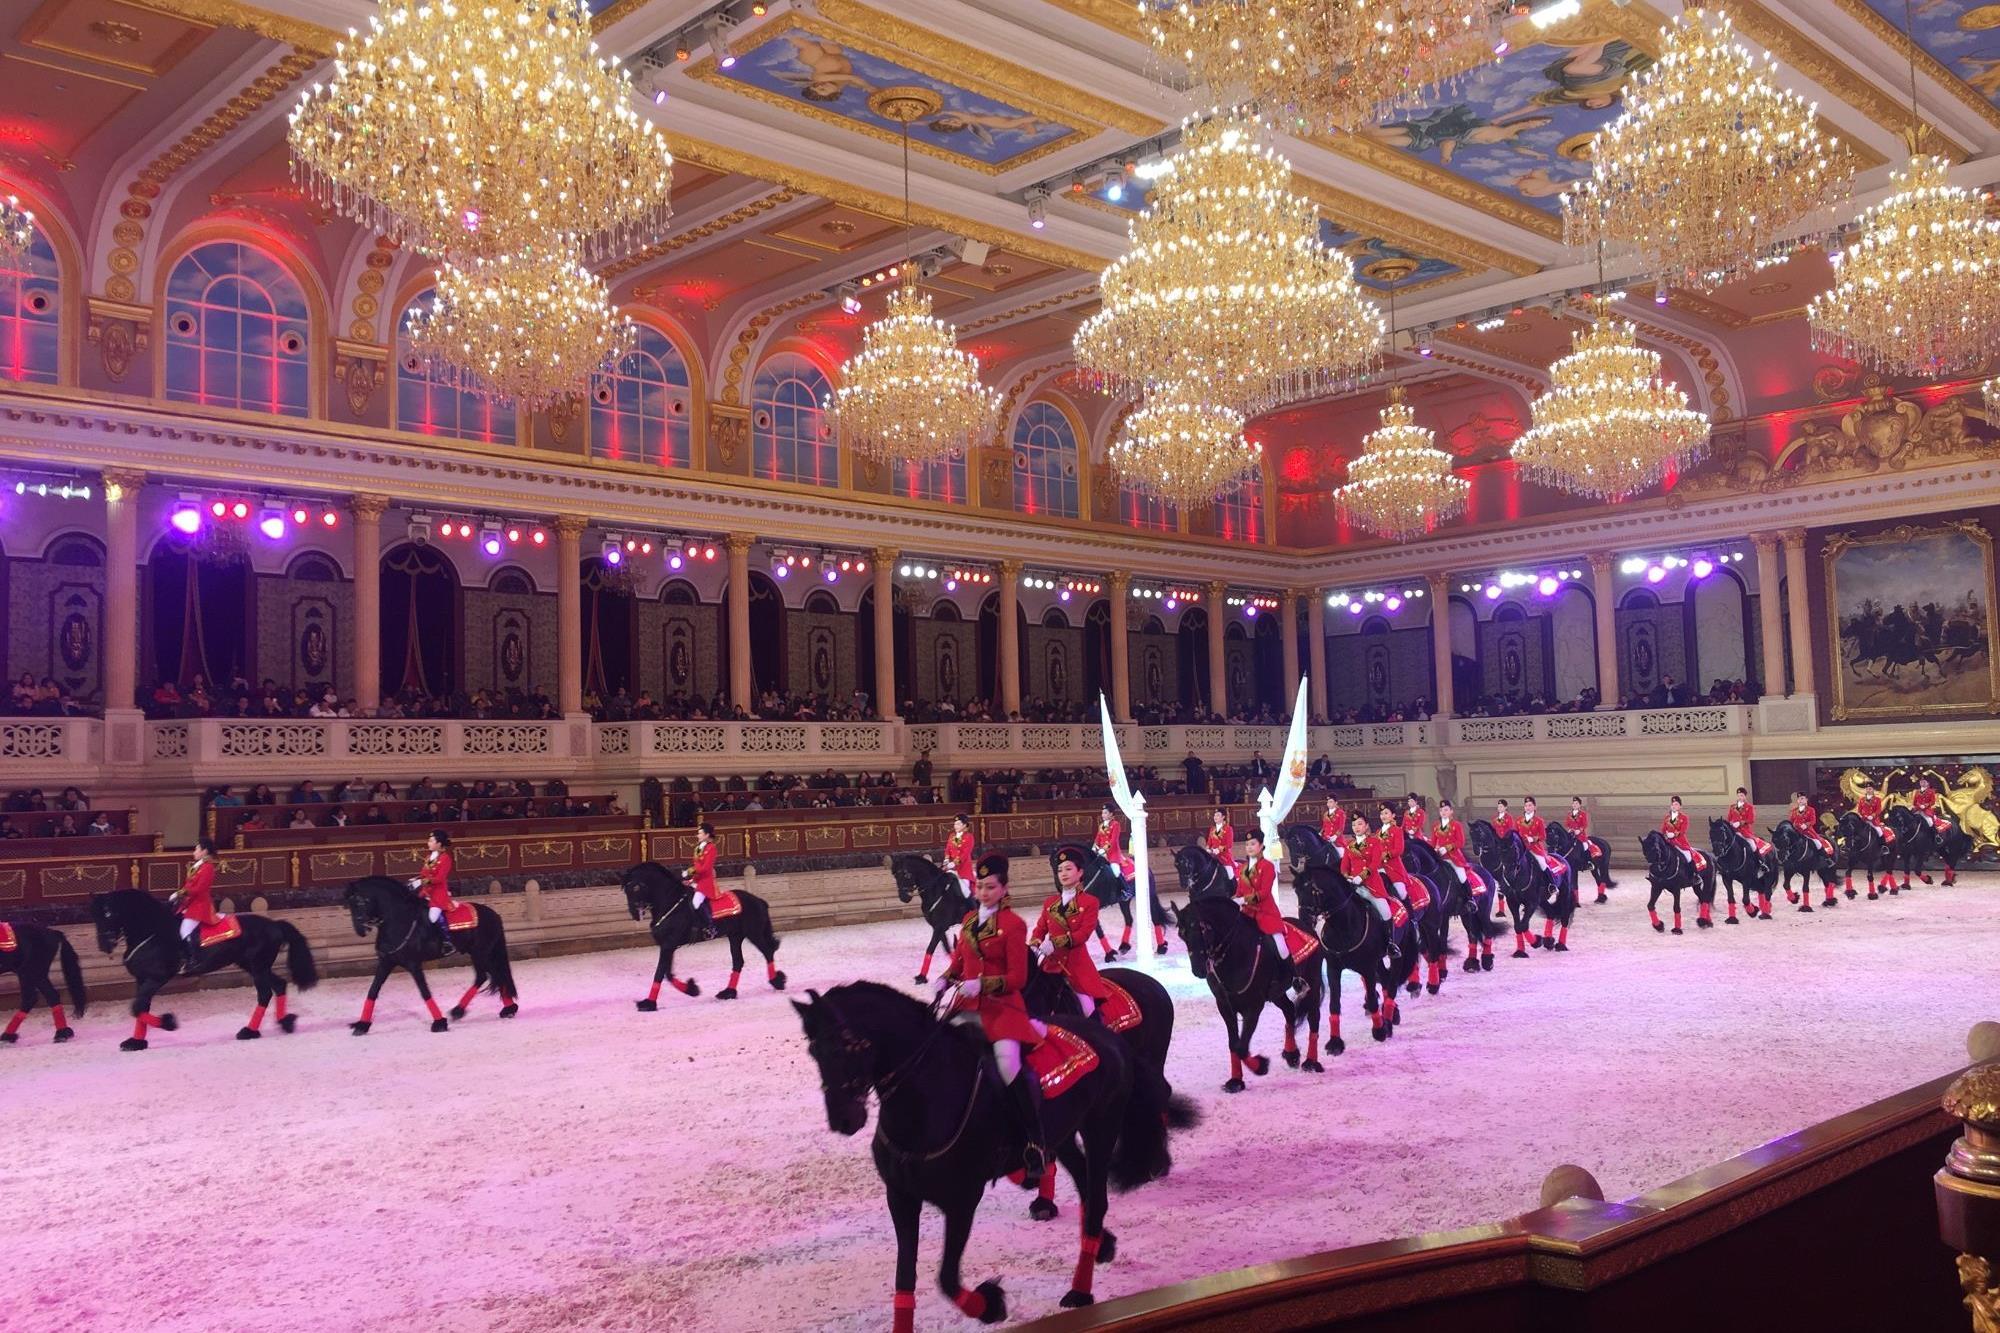 O Templo equestre chinês